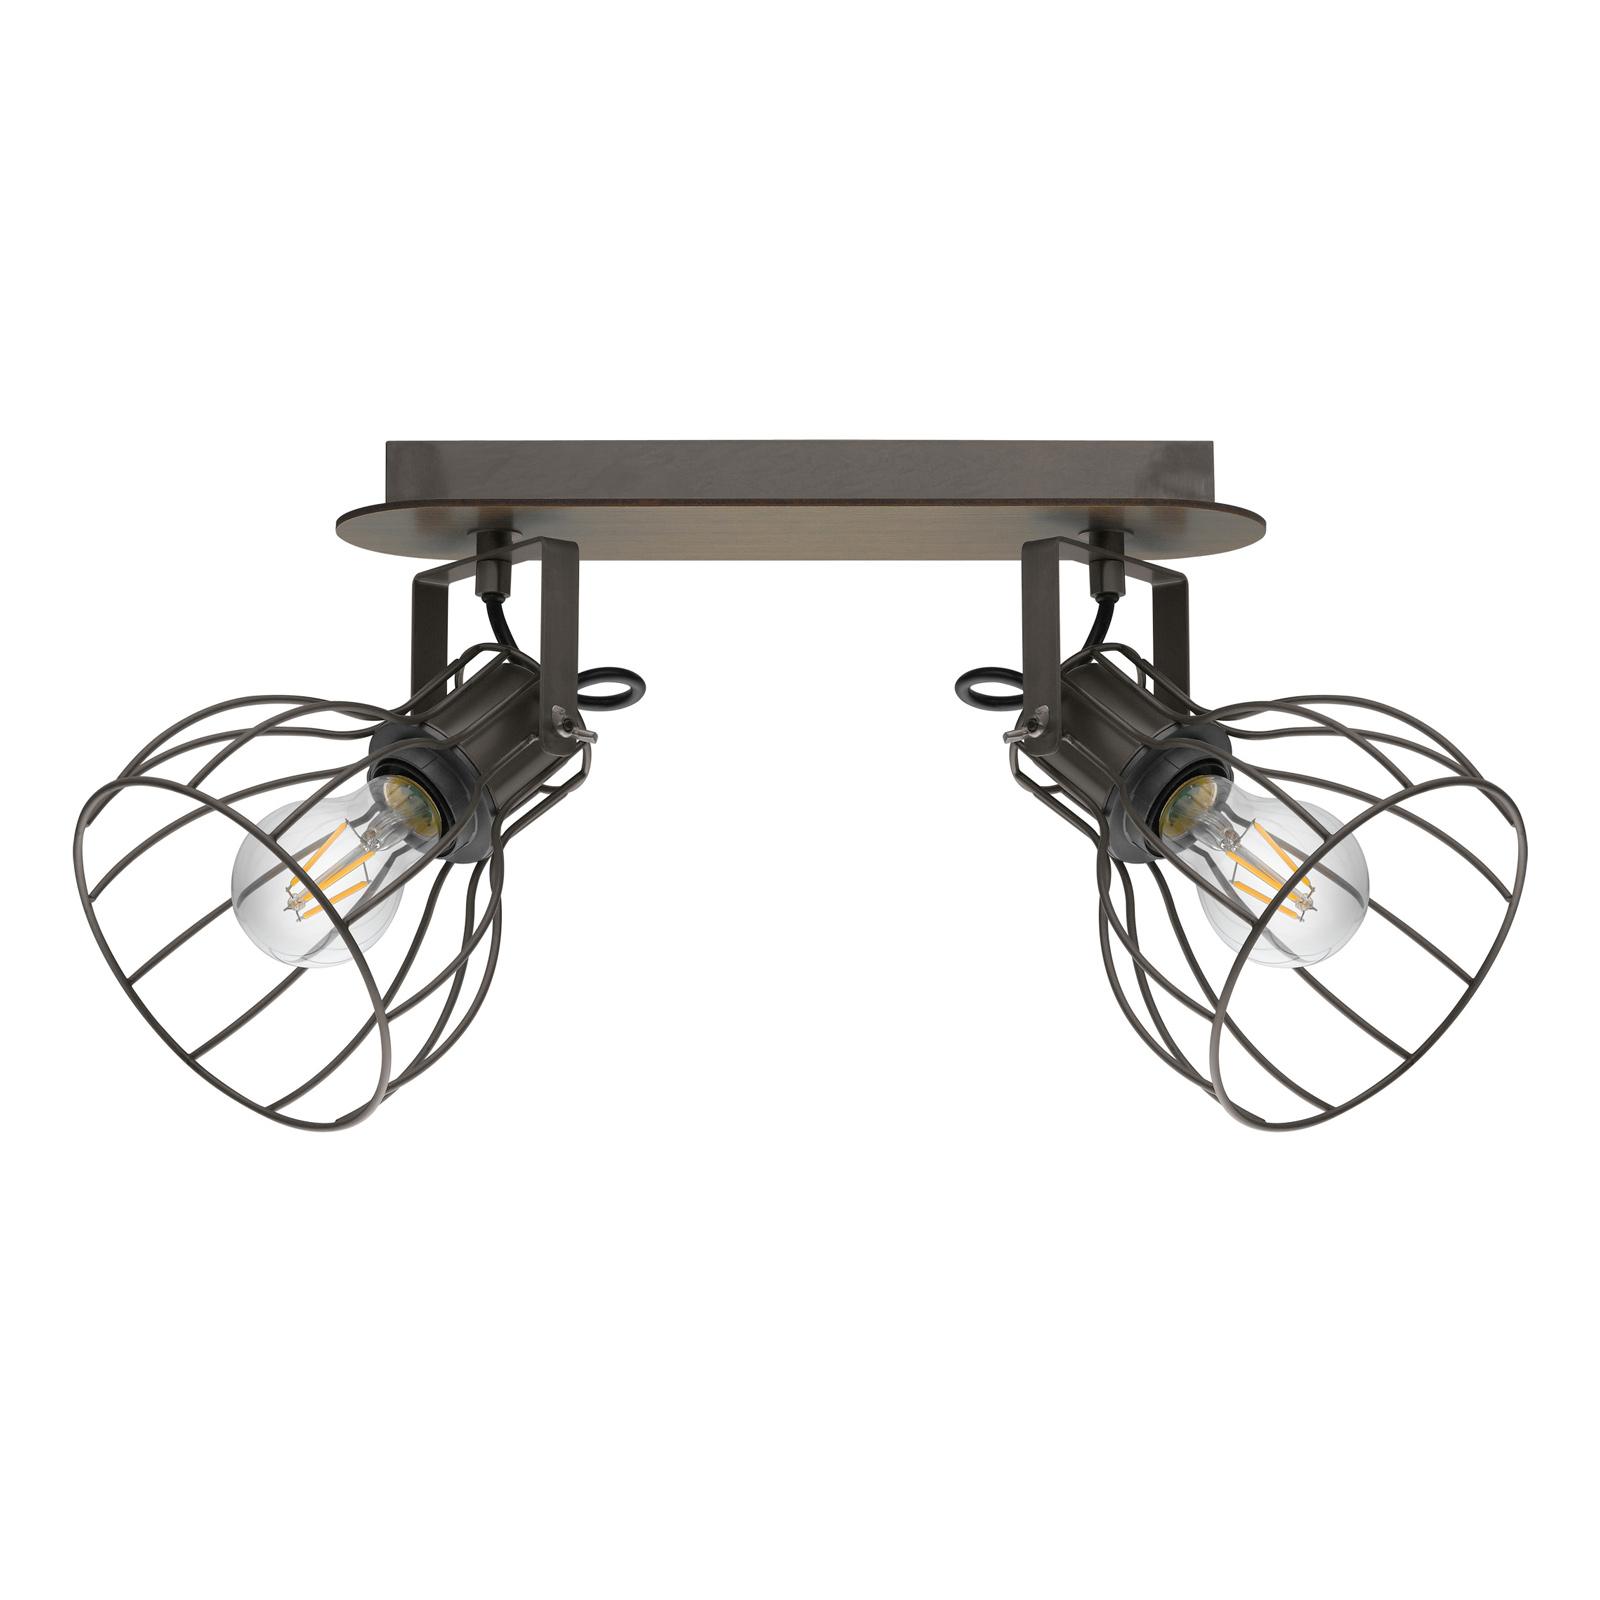 Lampa sufitowa Sambatello, 2-punktowa